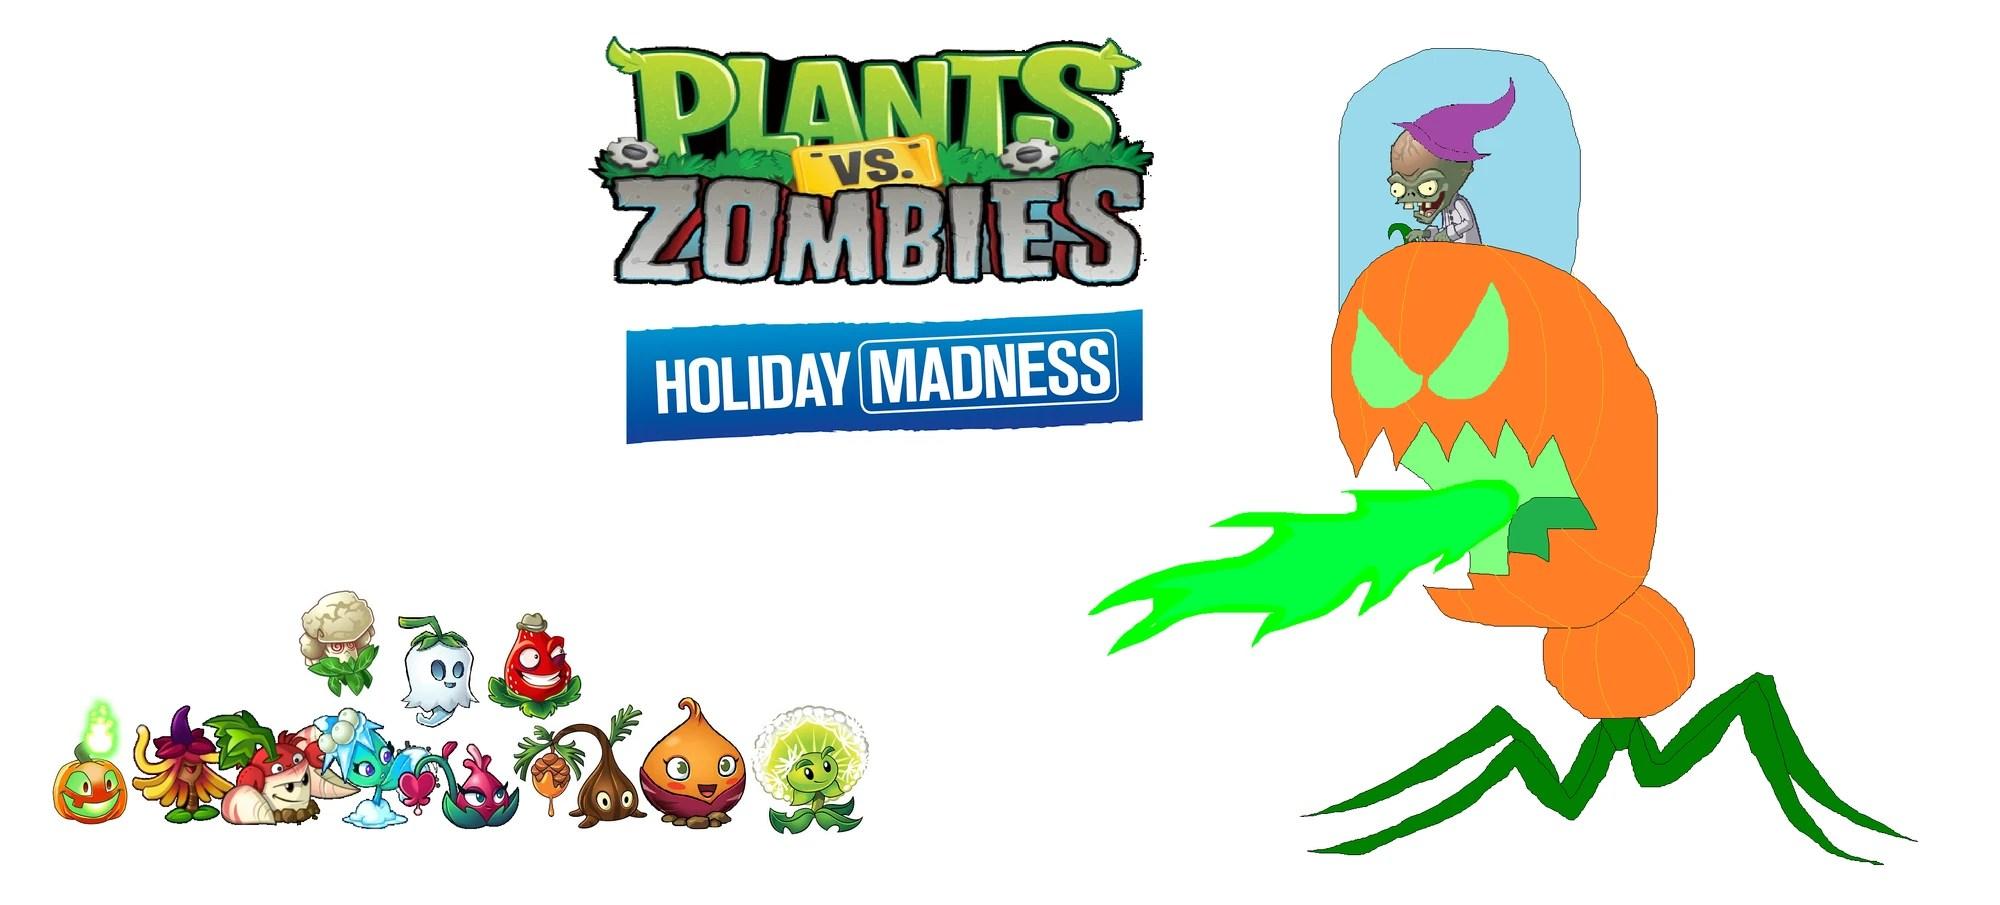 Moon Madness Plants Vs Zombies Wiki Fandom Powered – Cuitan